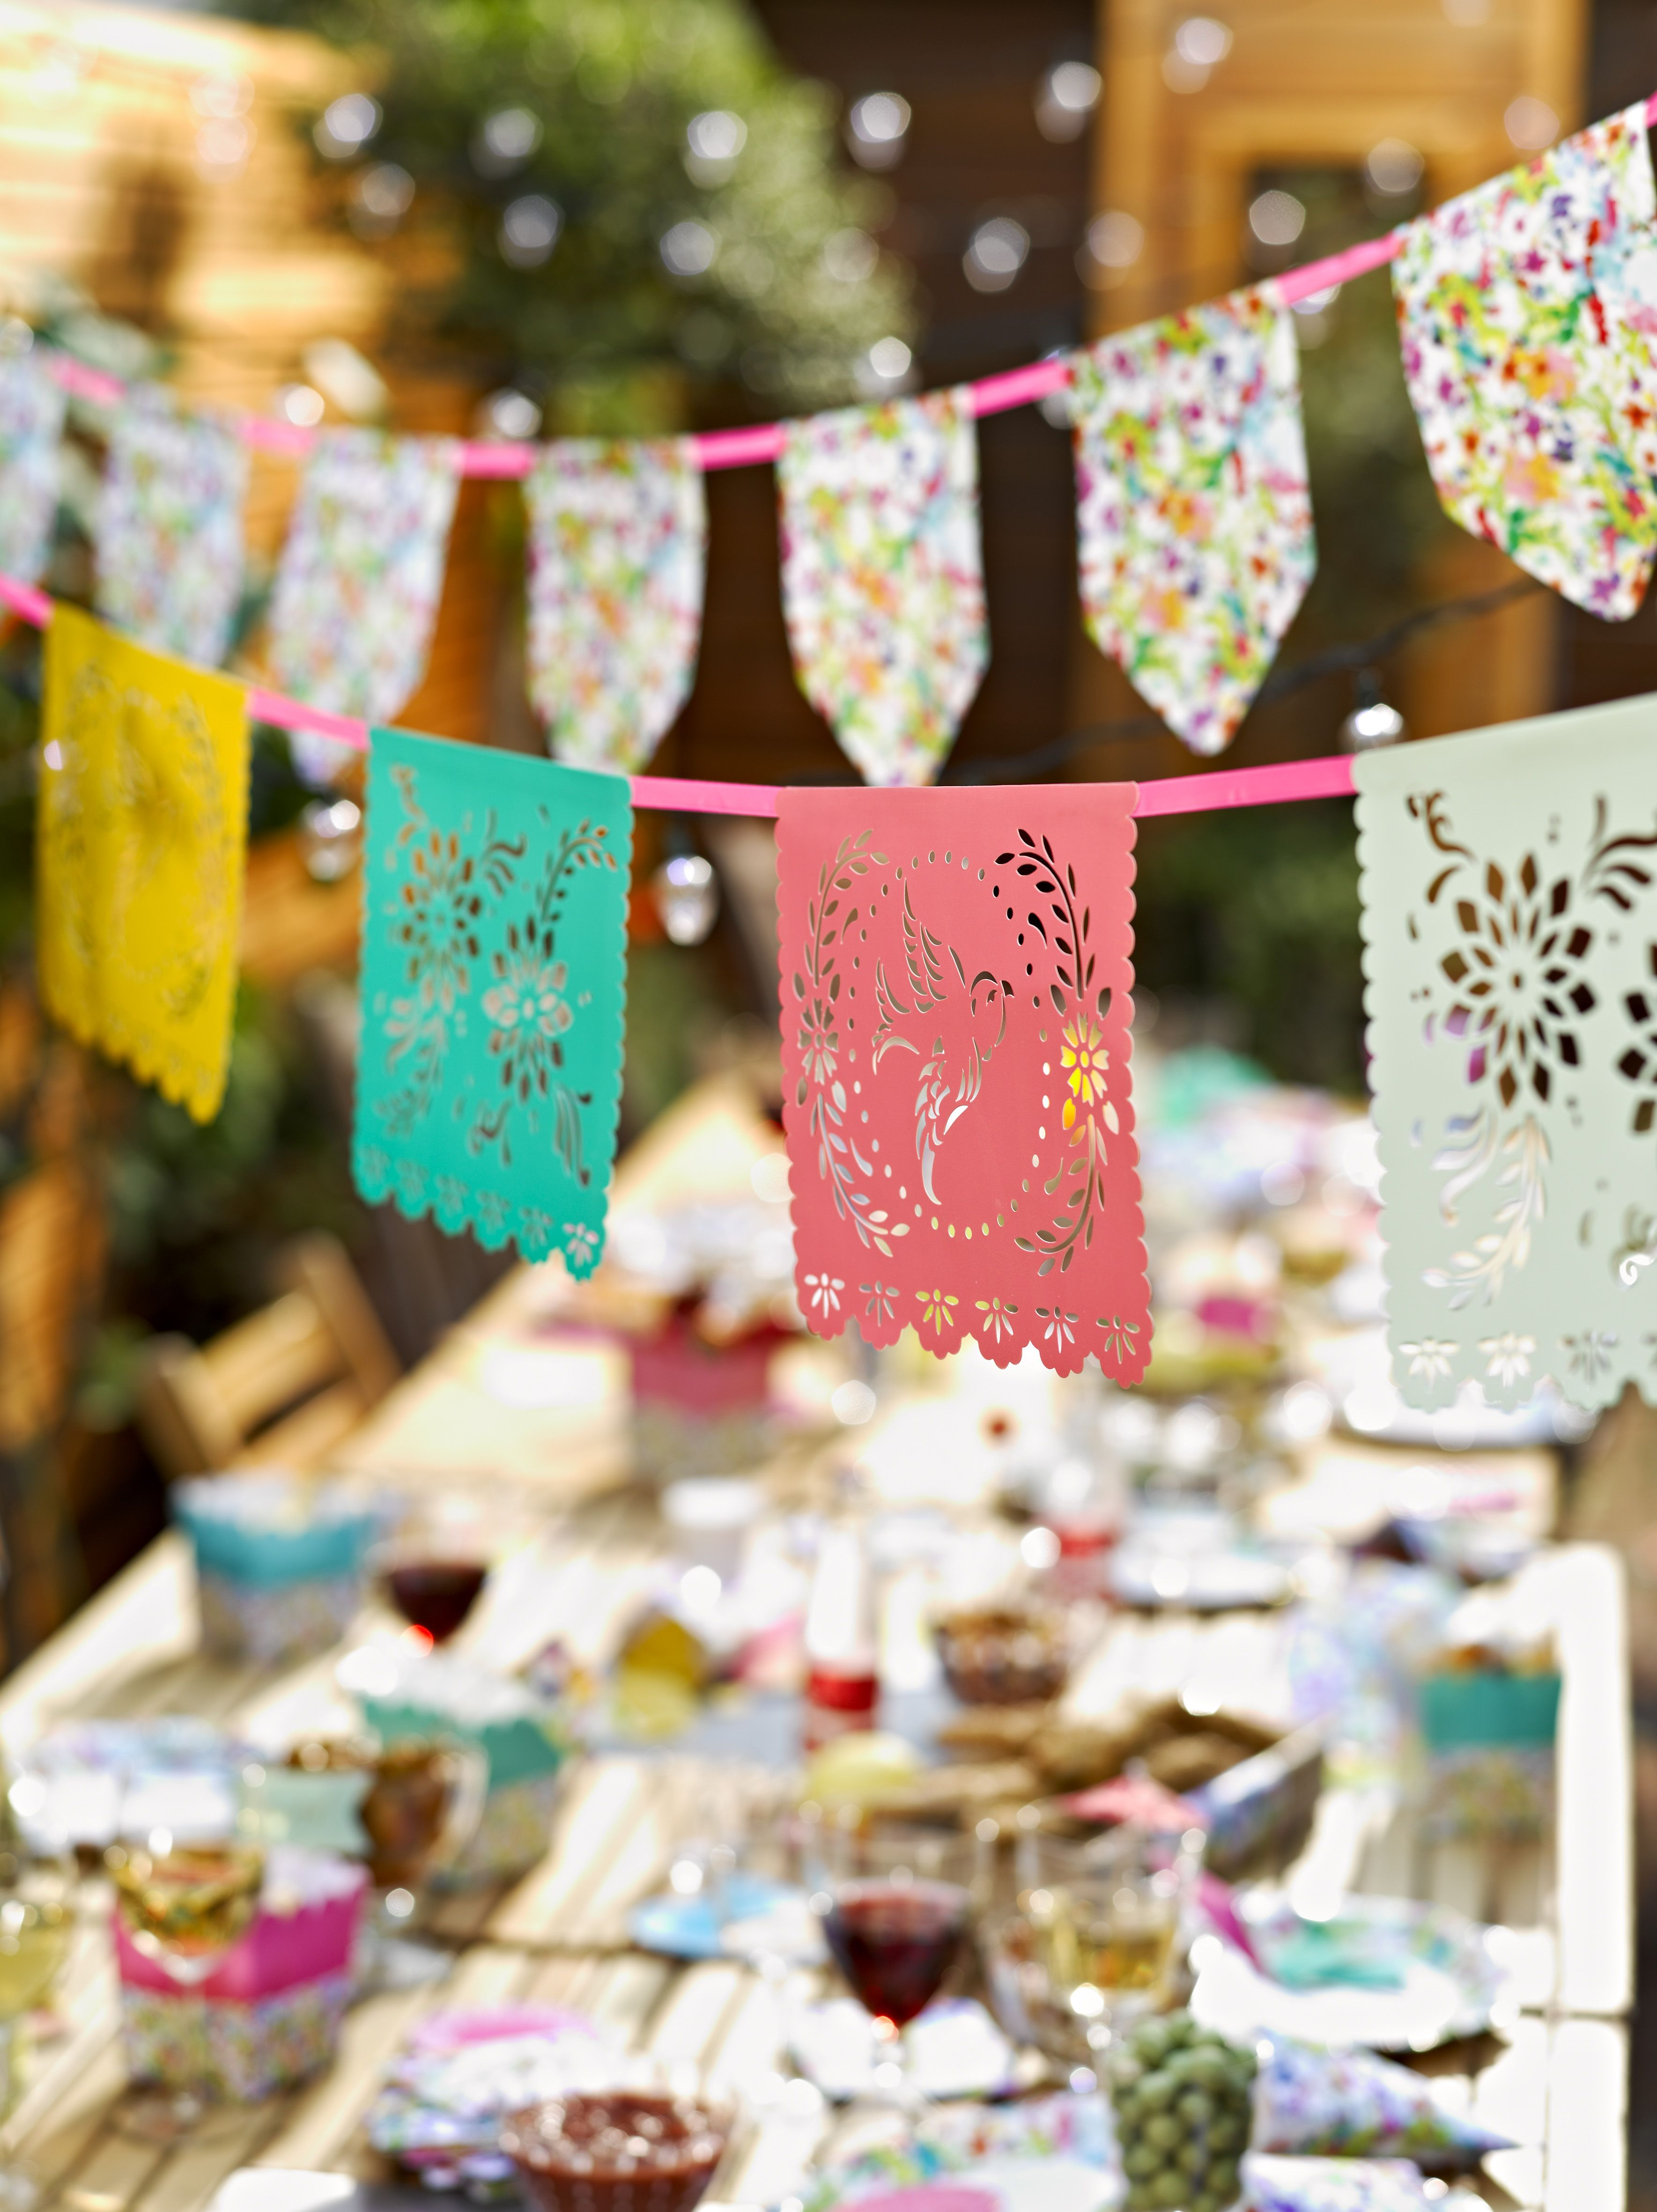 Fiesta table decorations ideas - Birthday Party Ideas